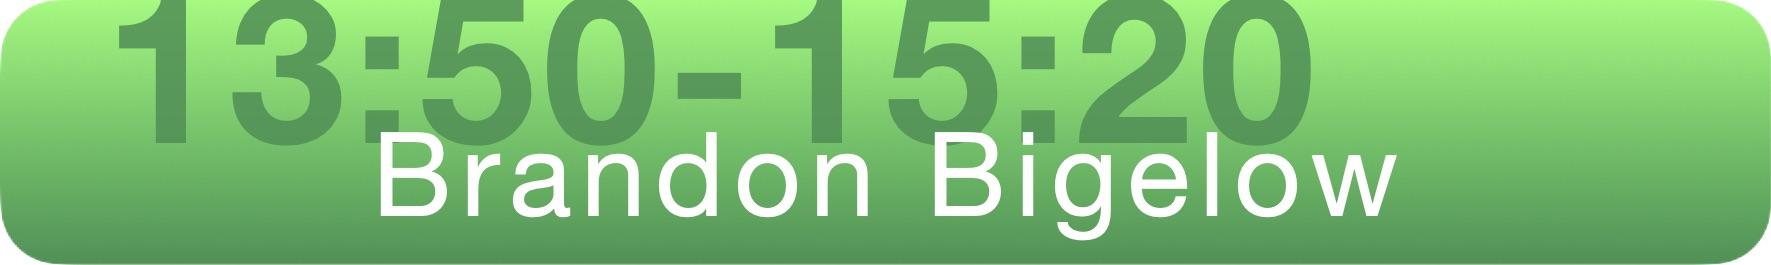 aa-brandon-bigelow-1350